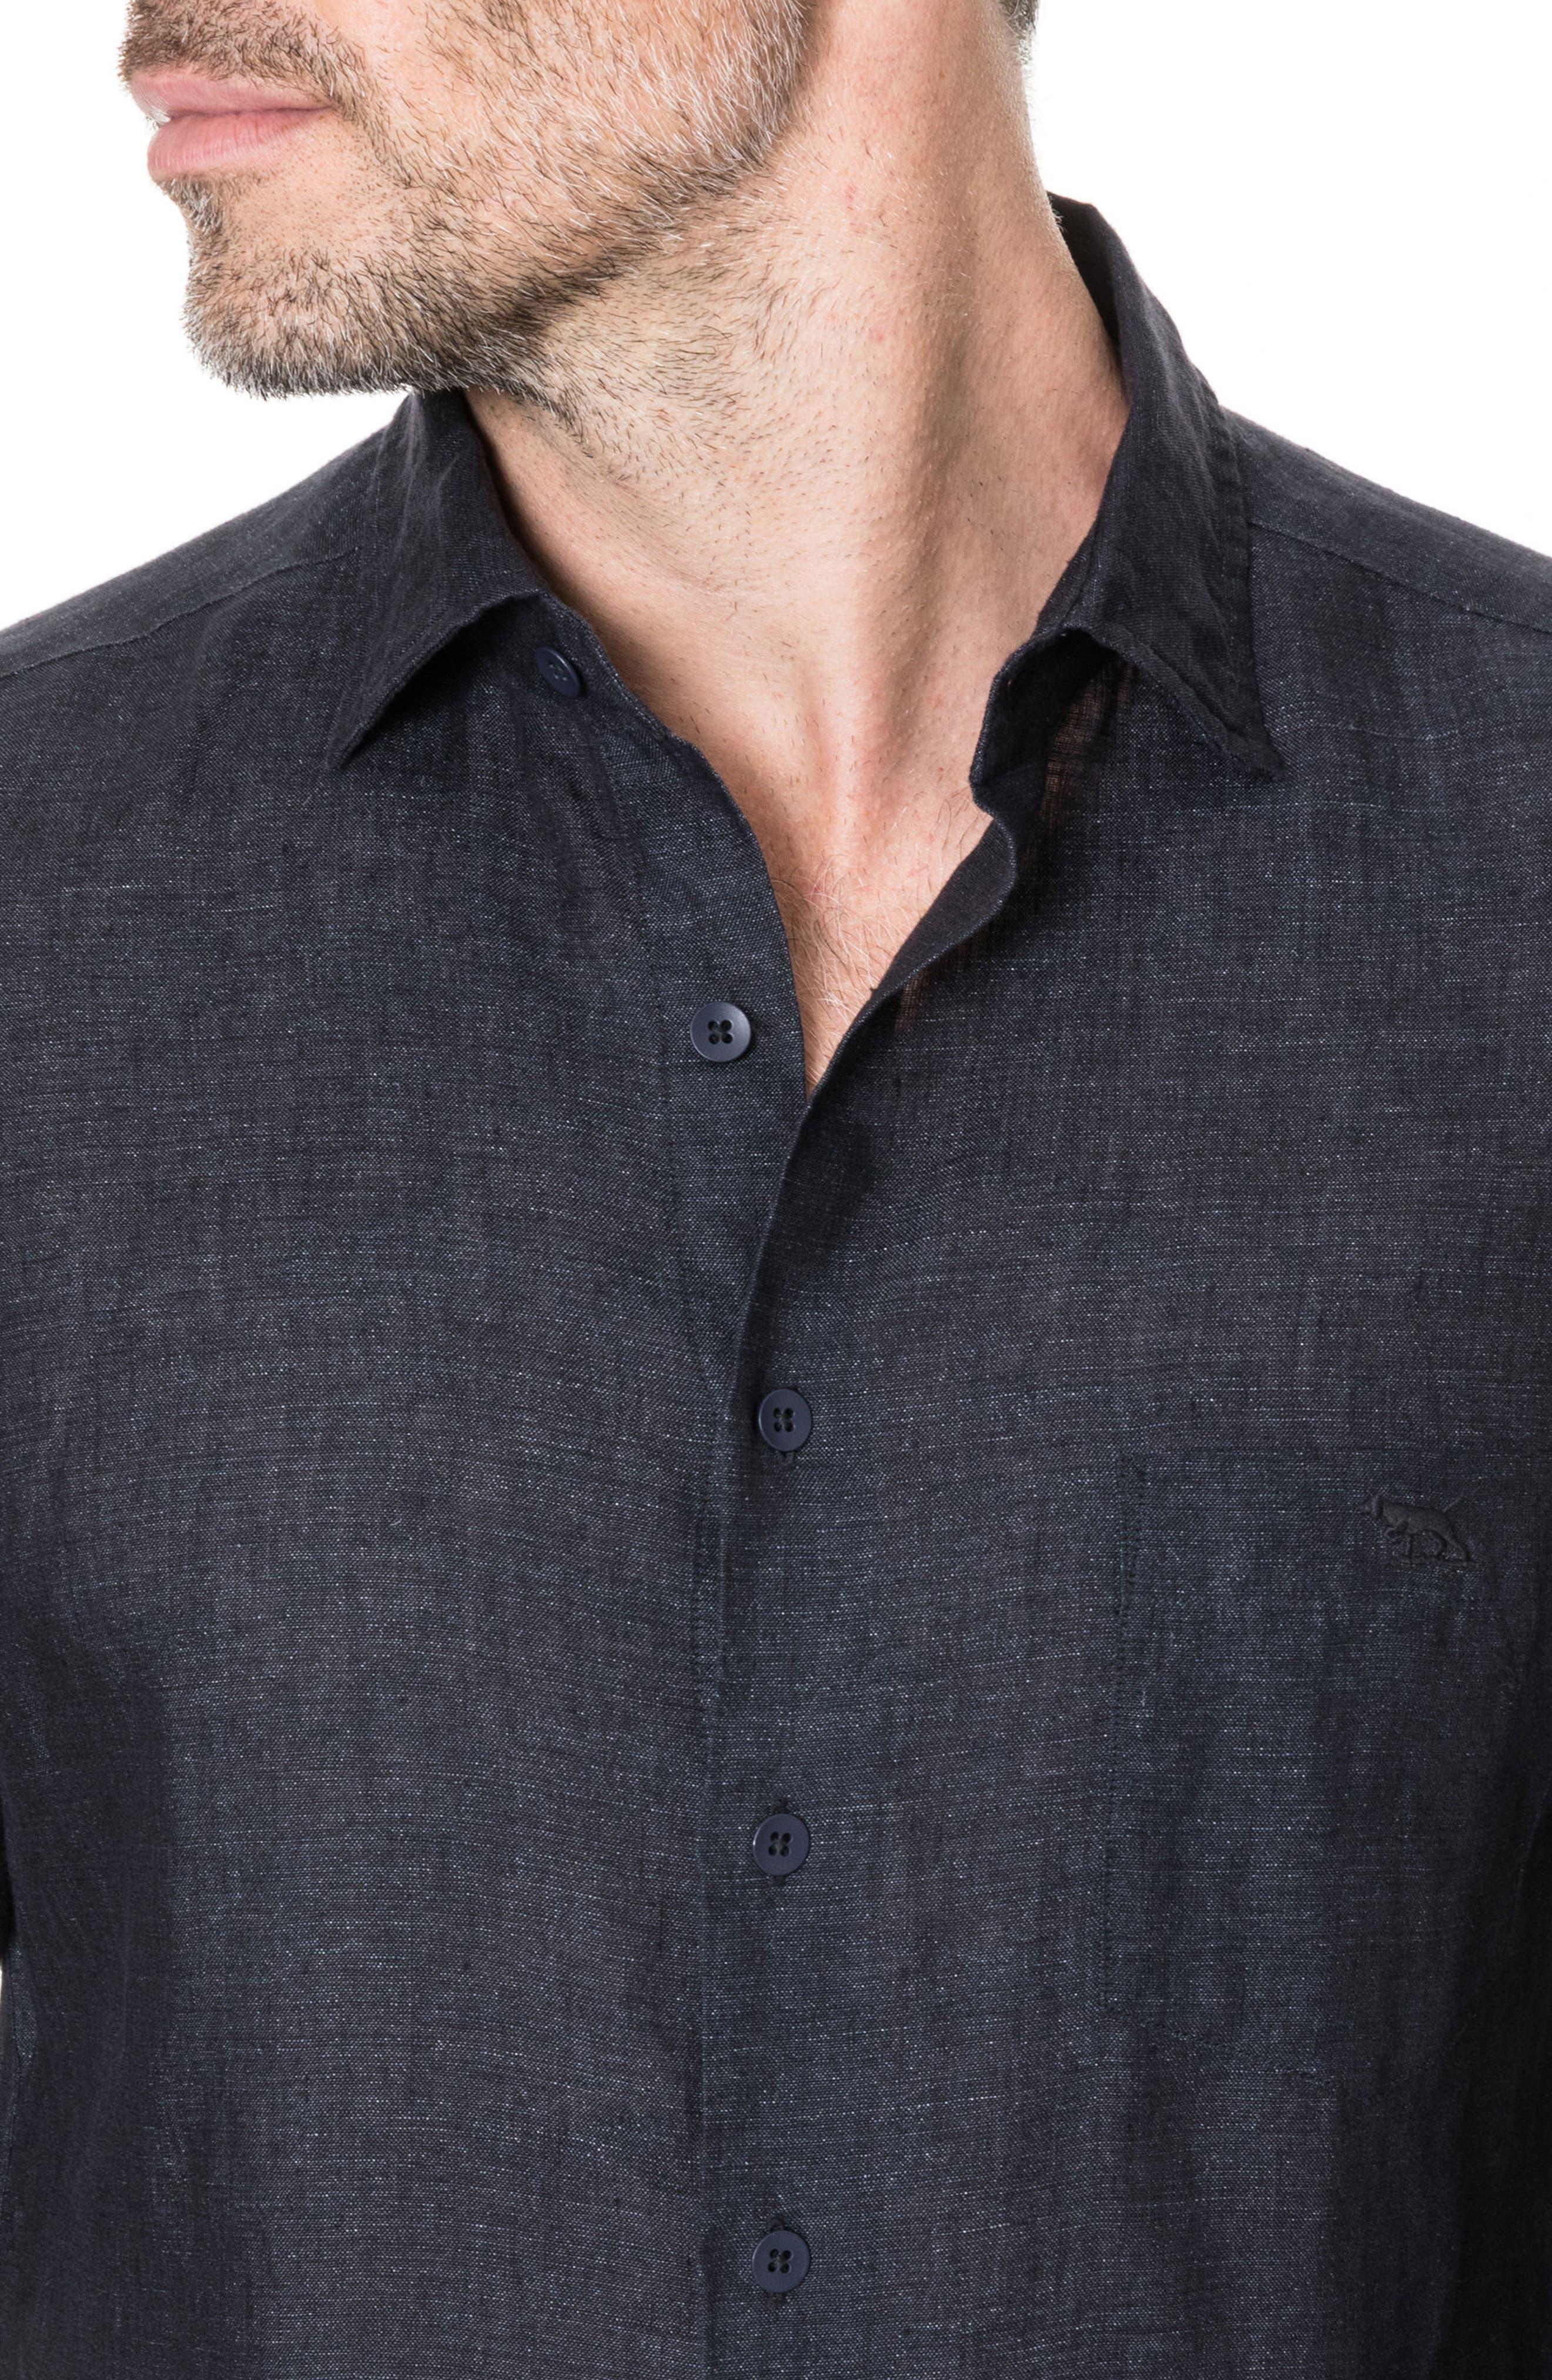 Landsdown Regular Fit Linen Sport Shirt,                             Alternate thumbnail 3, color,                             021